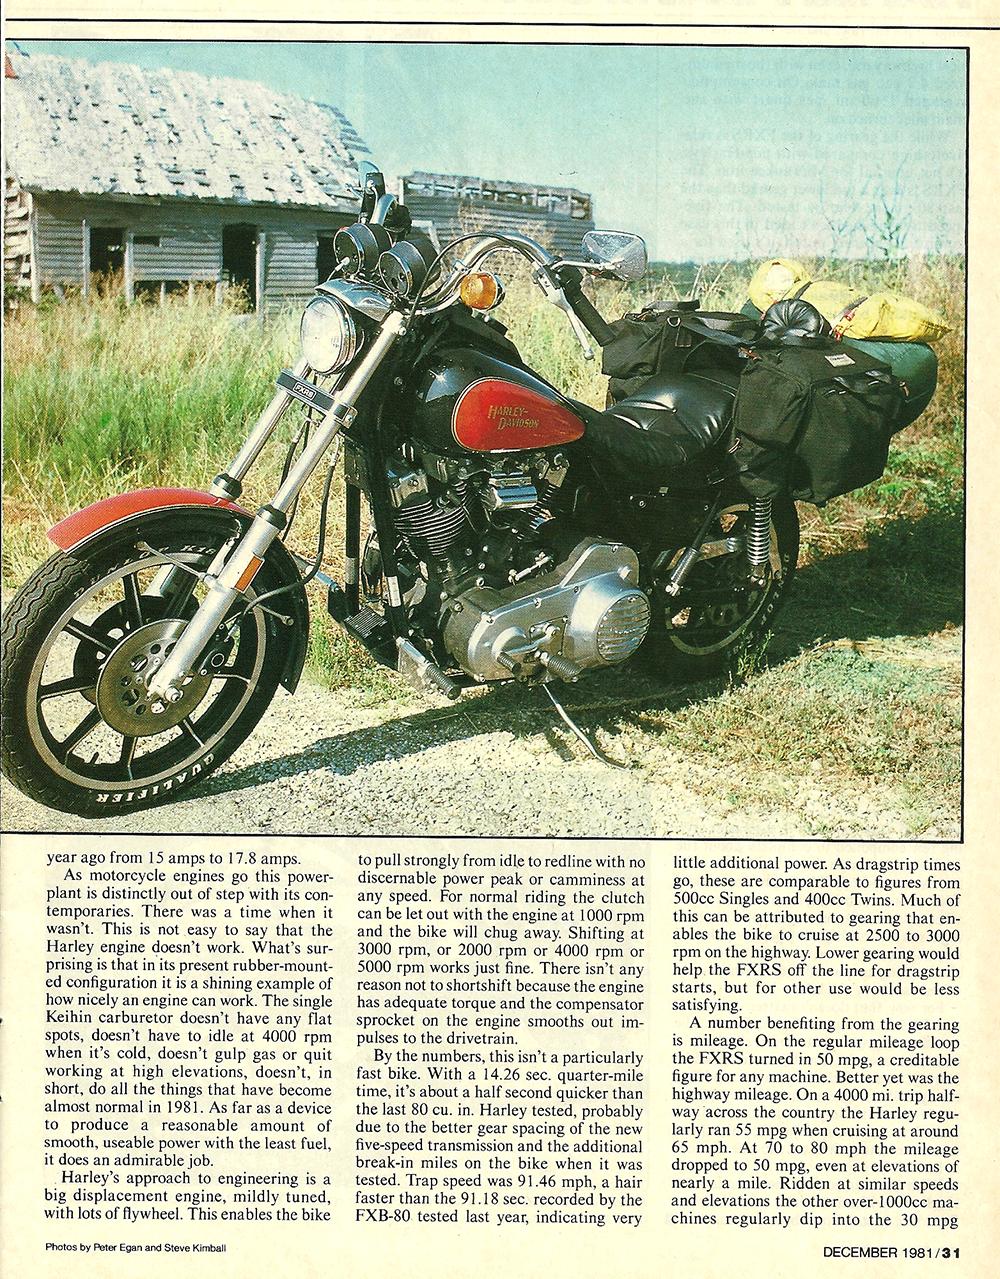 1981 Harley-Davidson FXRS road test 4.jpg